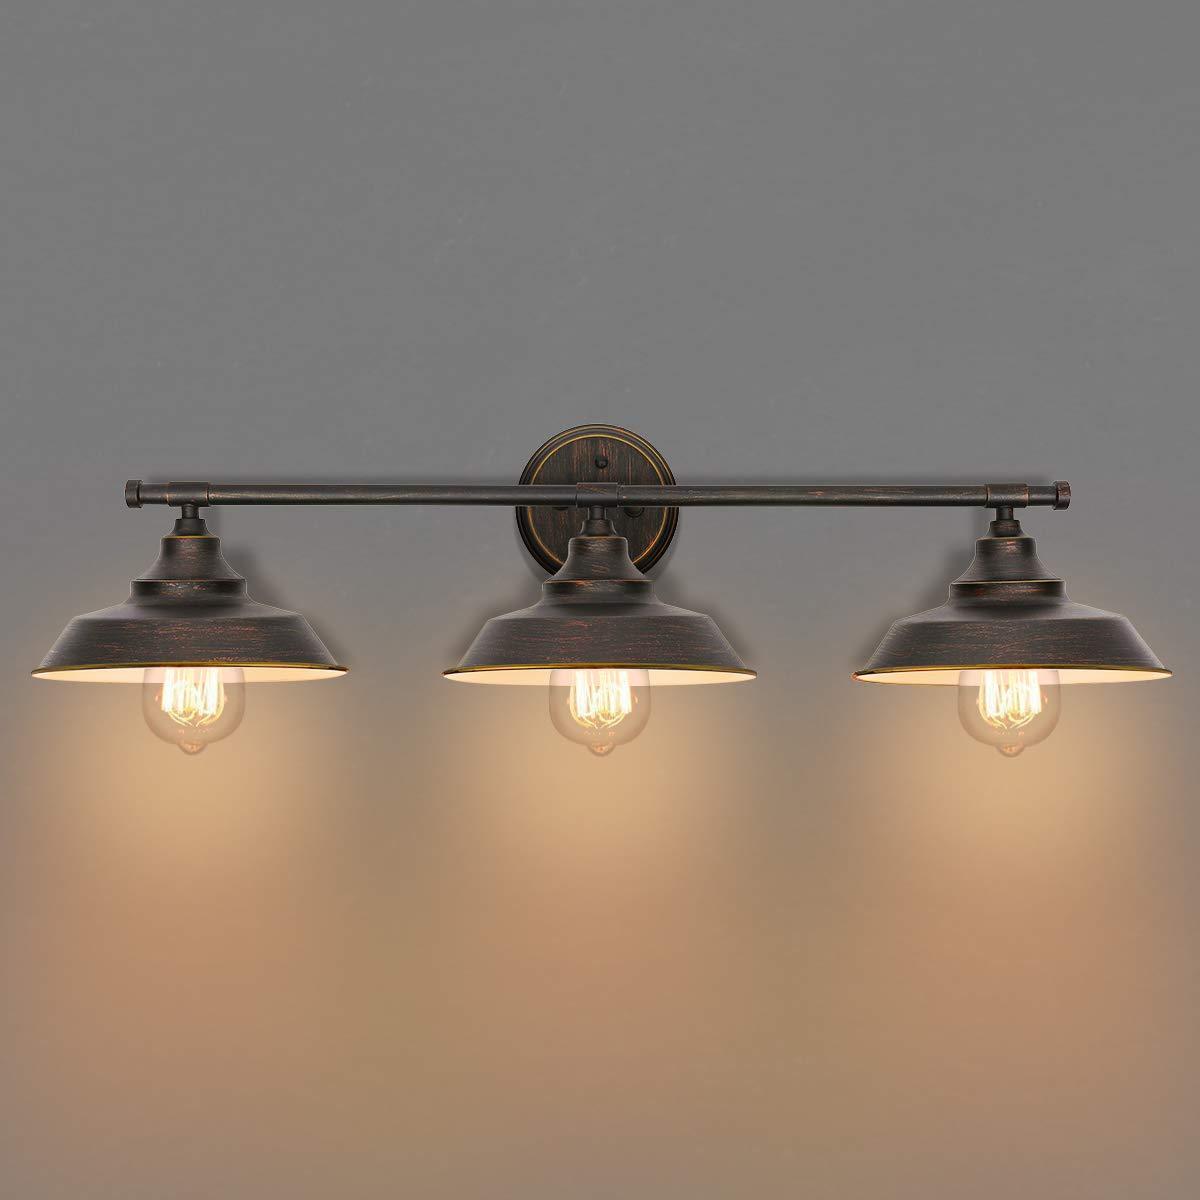 KingSo バスルーム 化粧台ライト 3ライト 壁取り付け用燭台 インダストリアル 屋内 壁取り付け ランプ シェード バスルーム キッチン リビングルーム ワークショップ カフェ B07GVH17DG